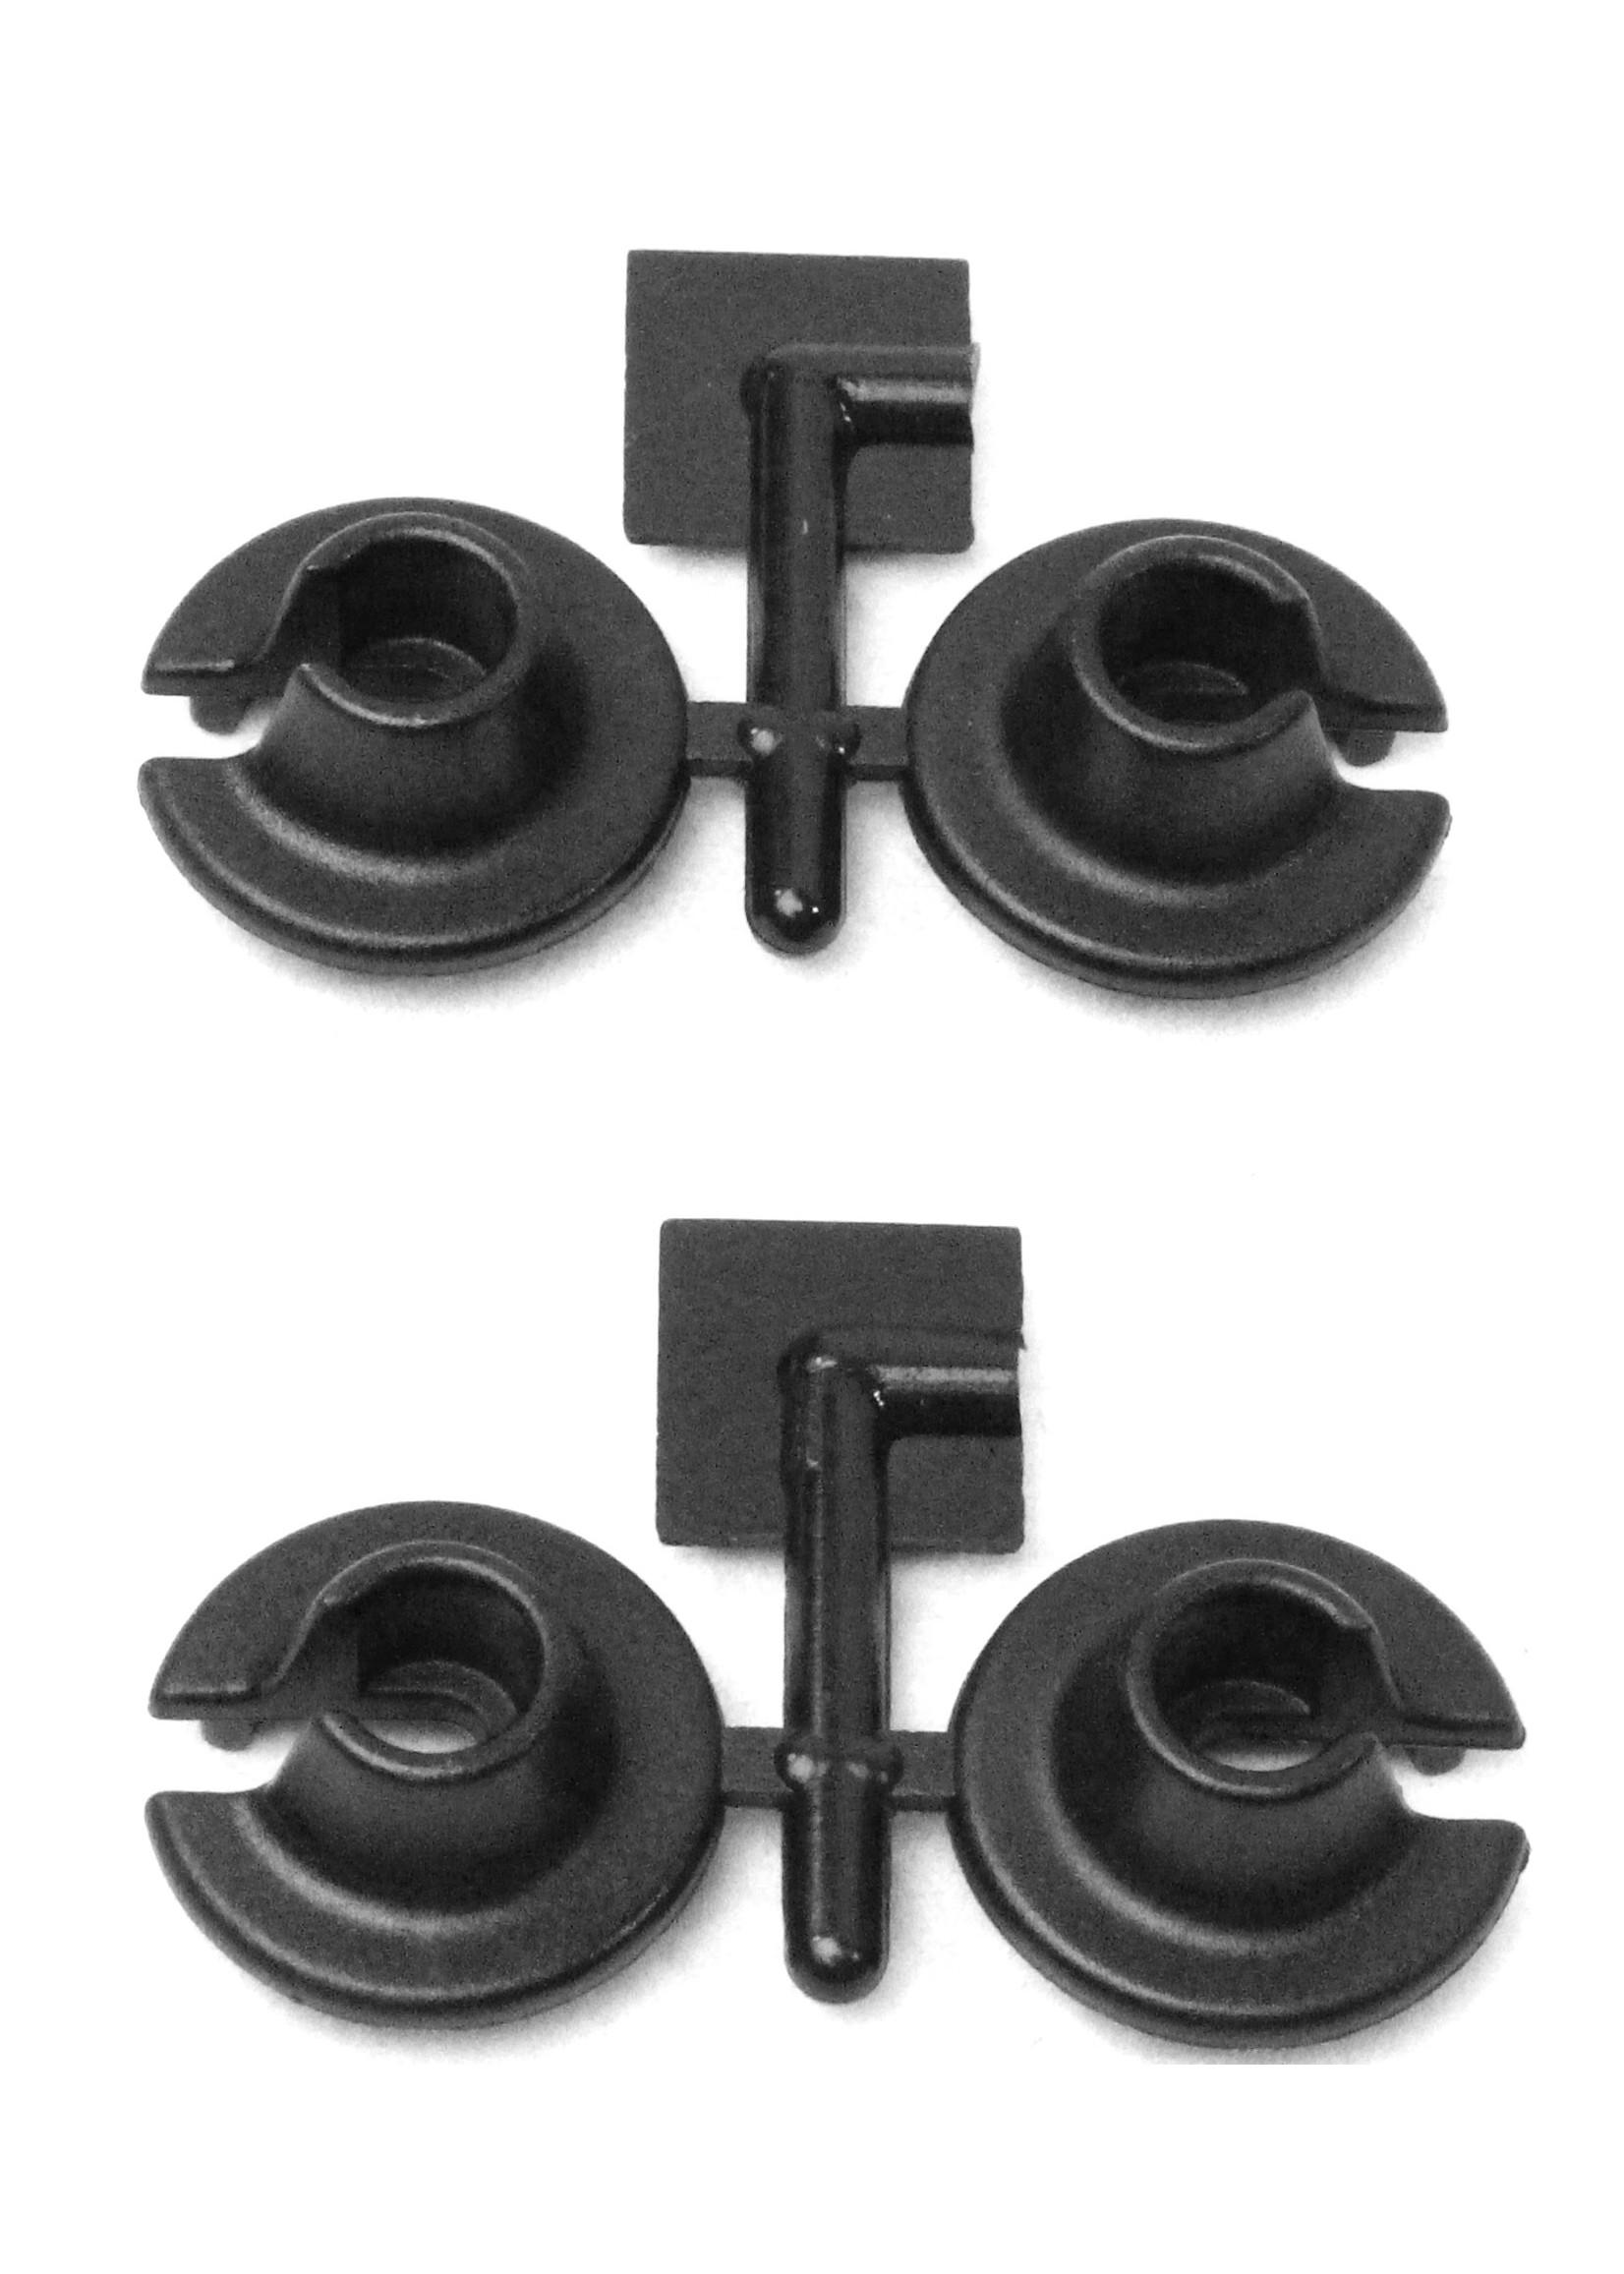 RPM RPM73152 RPM Black Shock Spring Cups - Losi, Traxxas, Assoc. MGT & HPI Savage Shocks